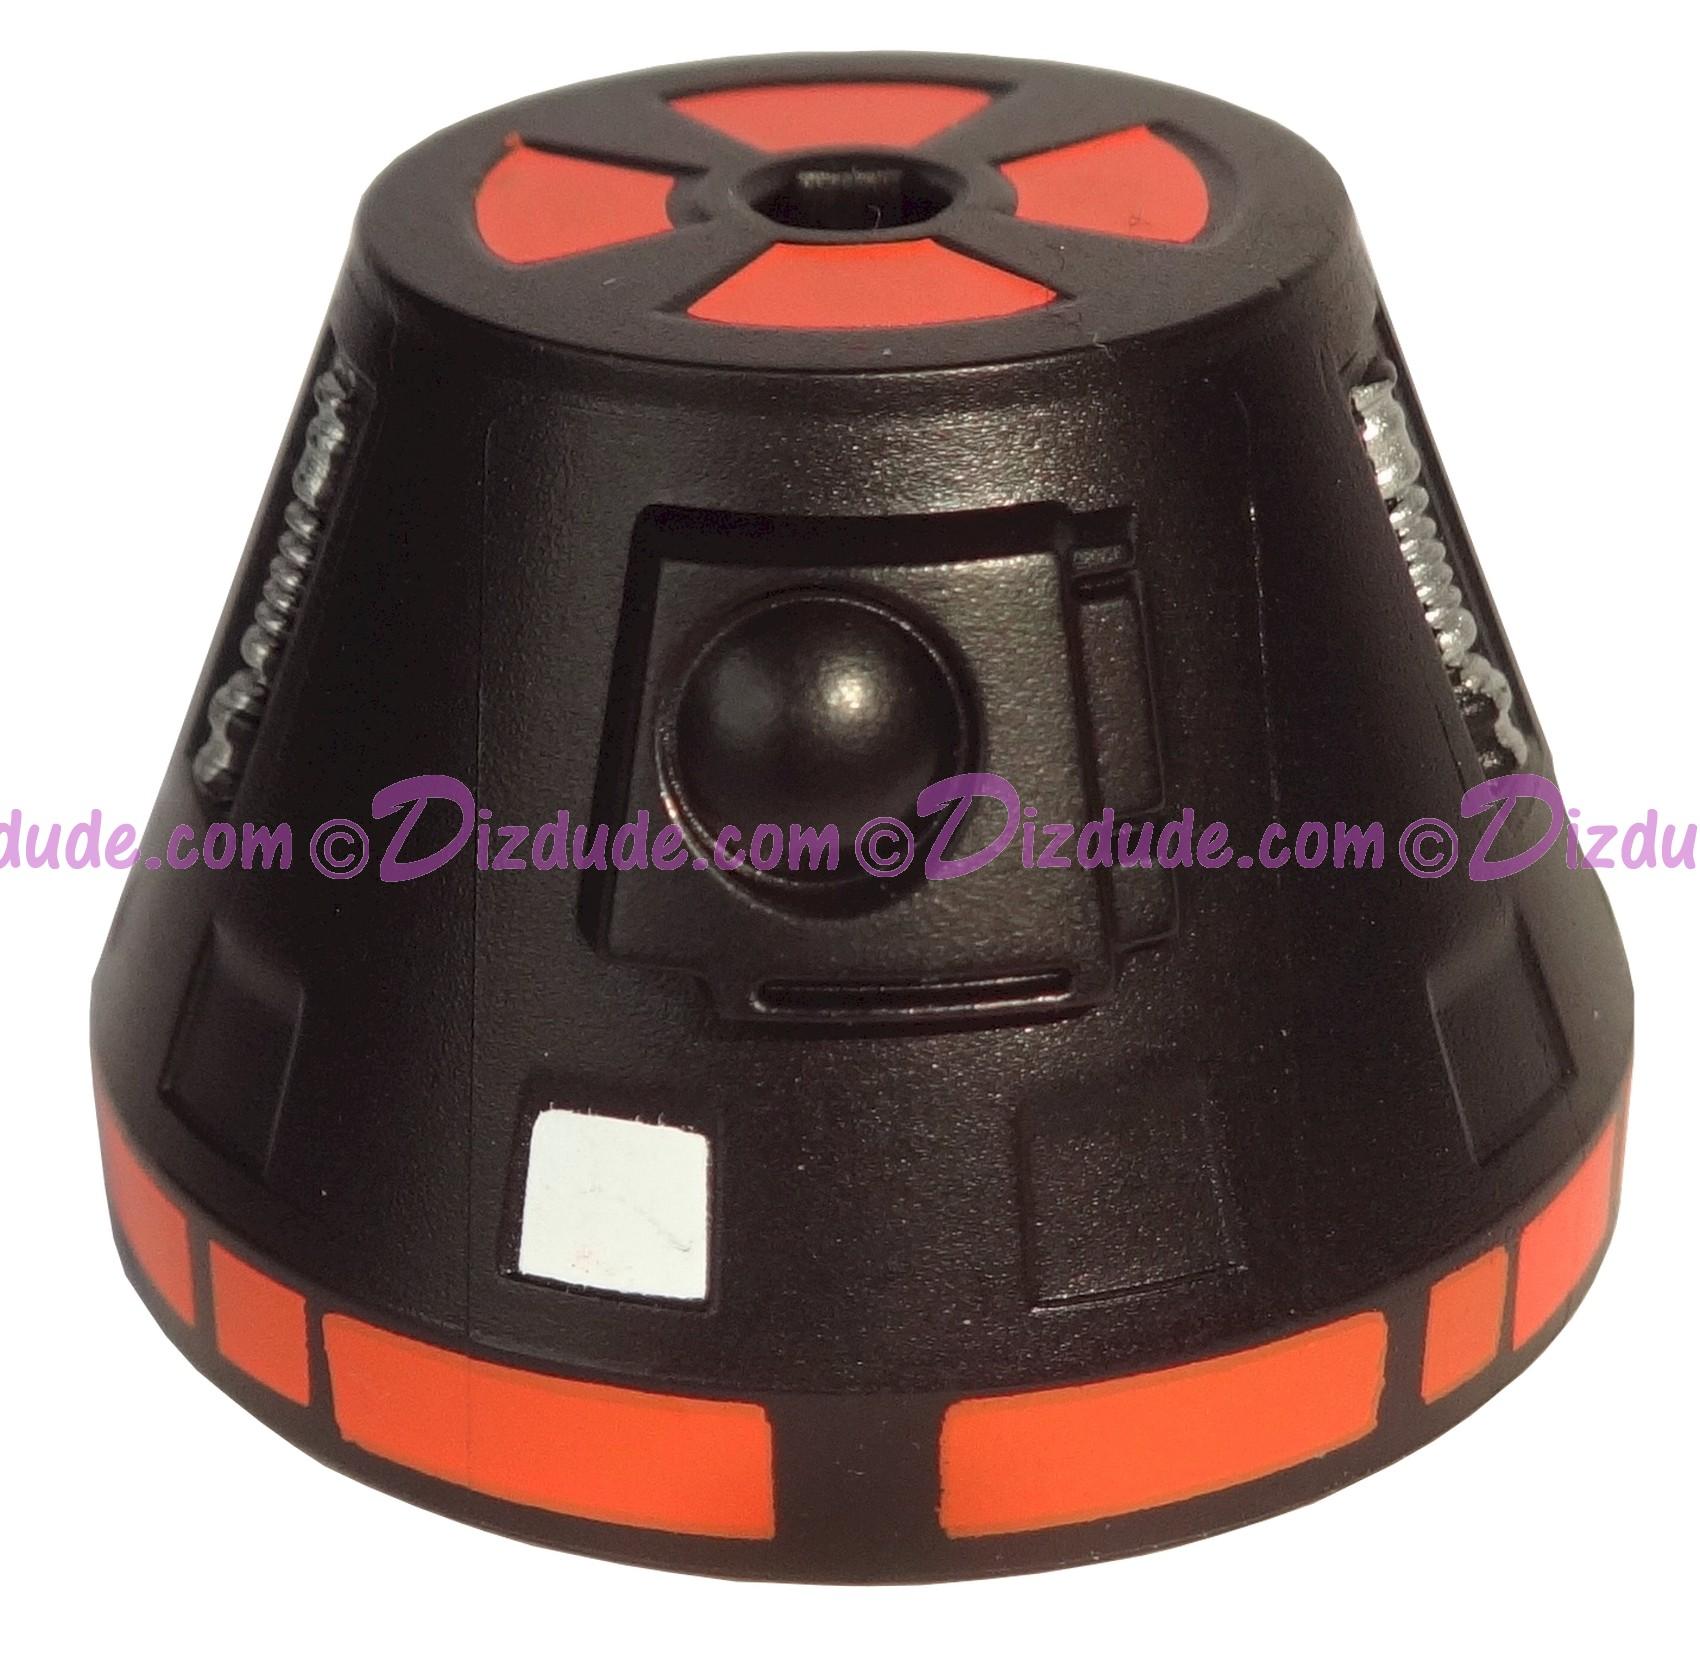 R0 Black Astromech Droid Dome ~ Series 2 from Disney Star Wars Build-A-Droid Factory © Dizdude.com